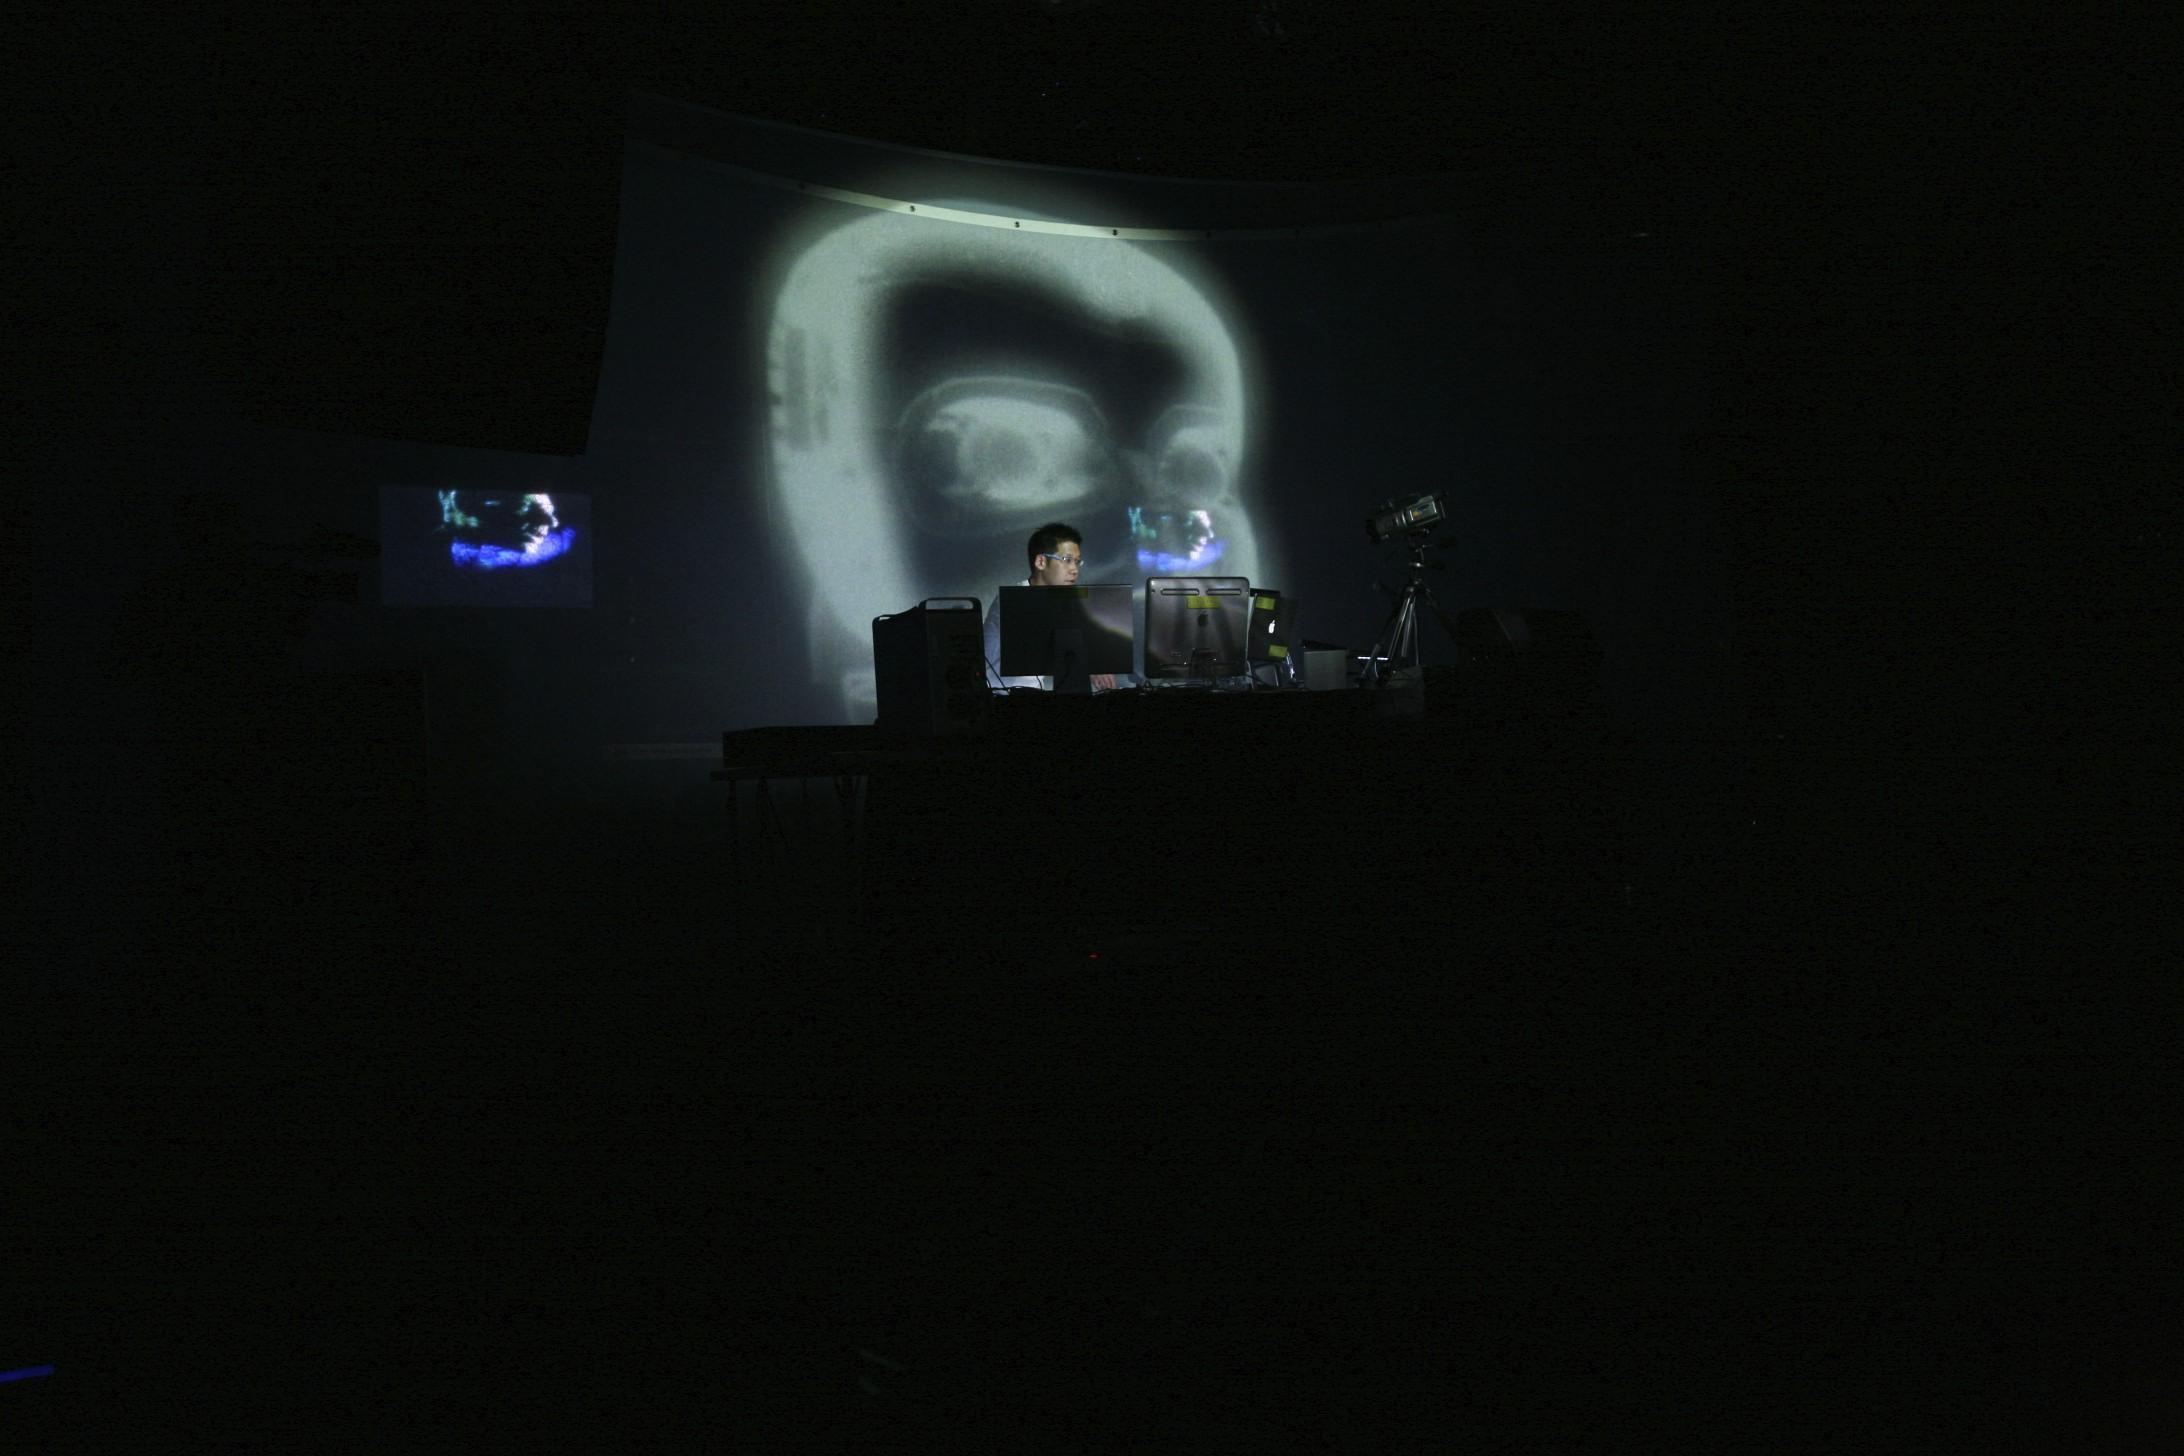 080328_B2_상상두_드림 Choice전자음악 퍼포먼스 (22)